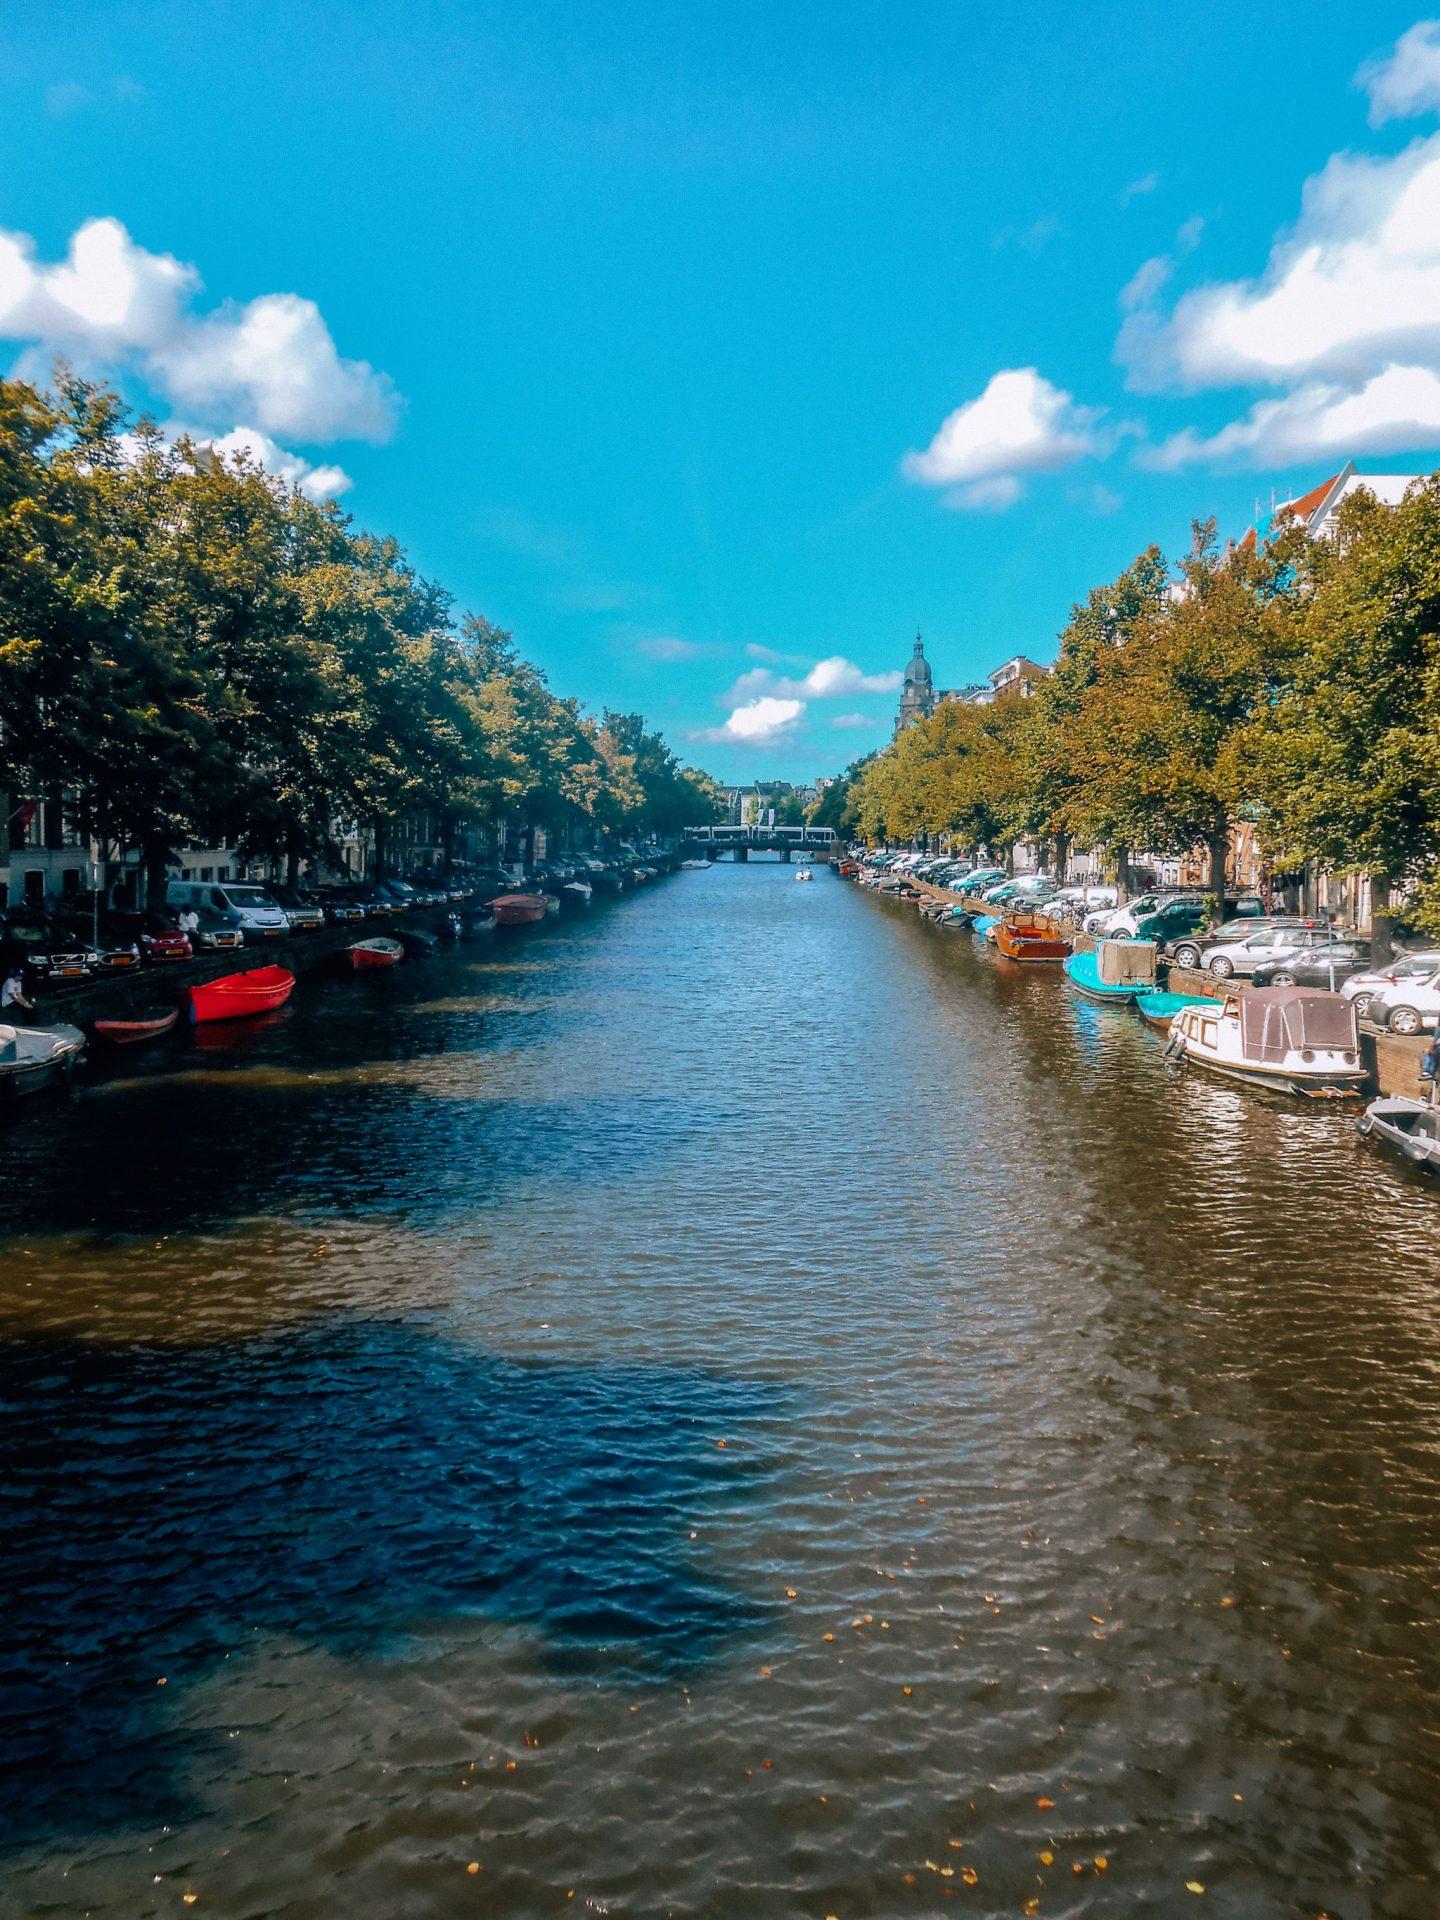 amsterdam, the netherlands, city, mother-daughter getaways, travel, inspire